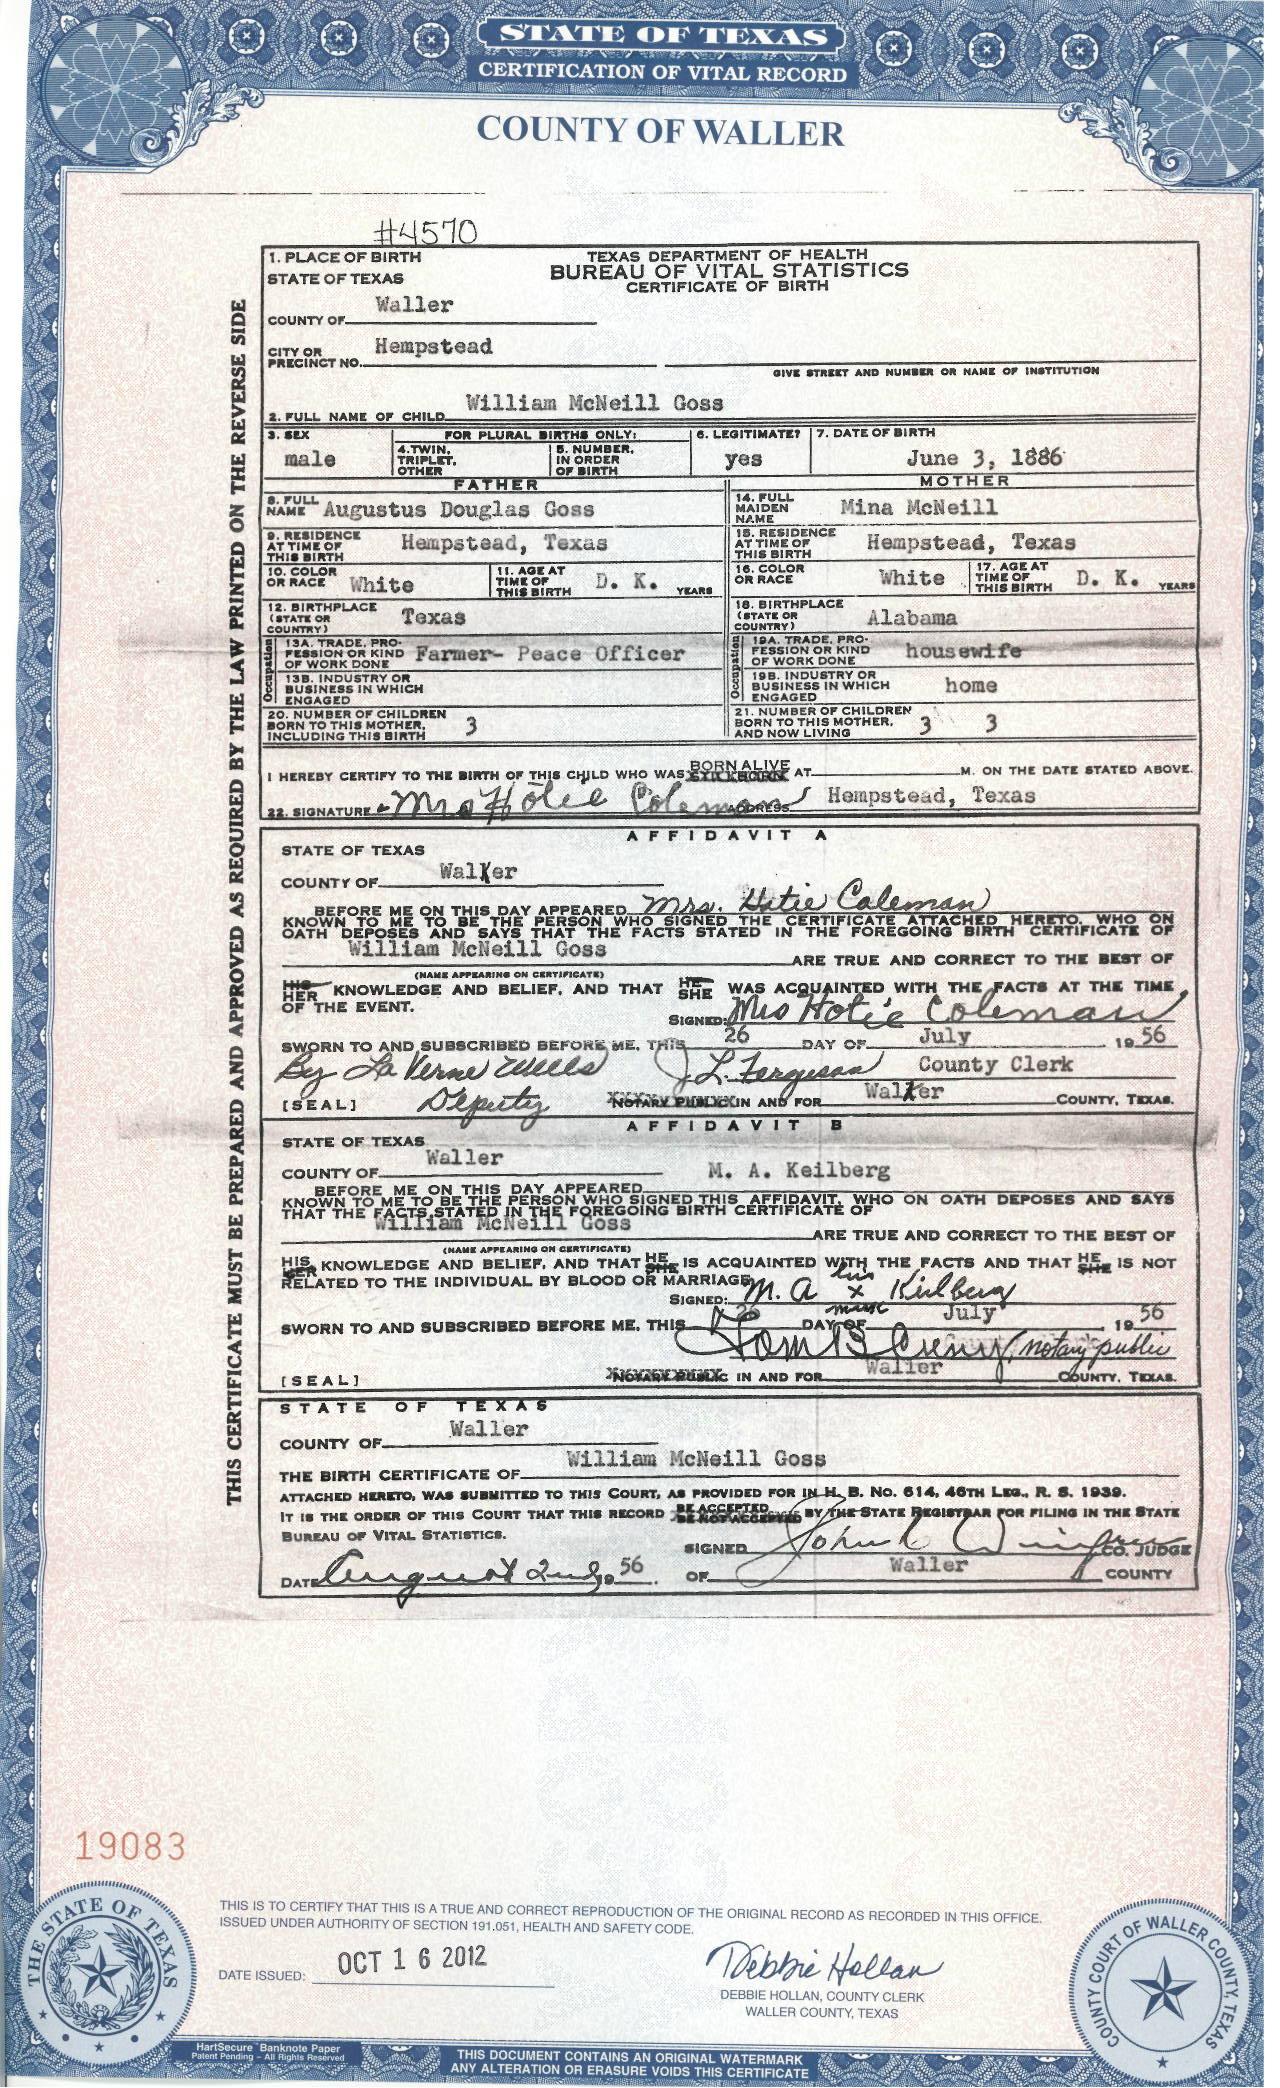 Eva edith raven william goss bio william gosss birth certificate aiddatafo Choice Image